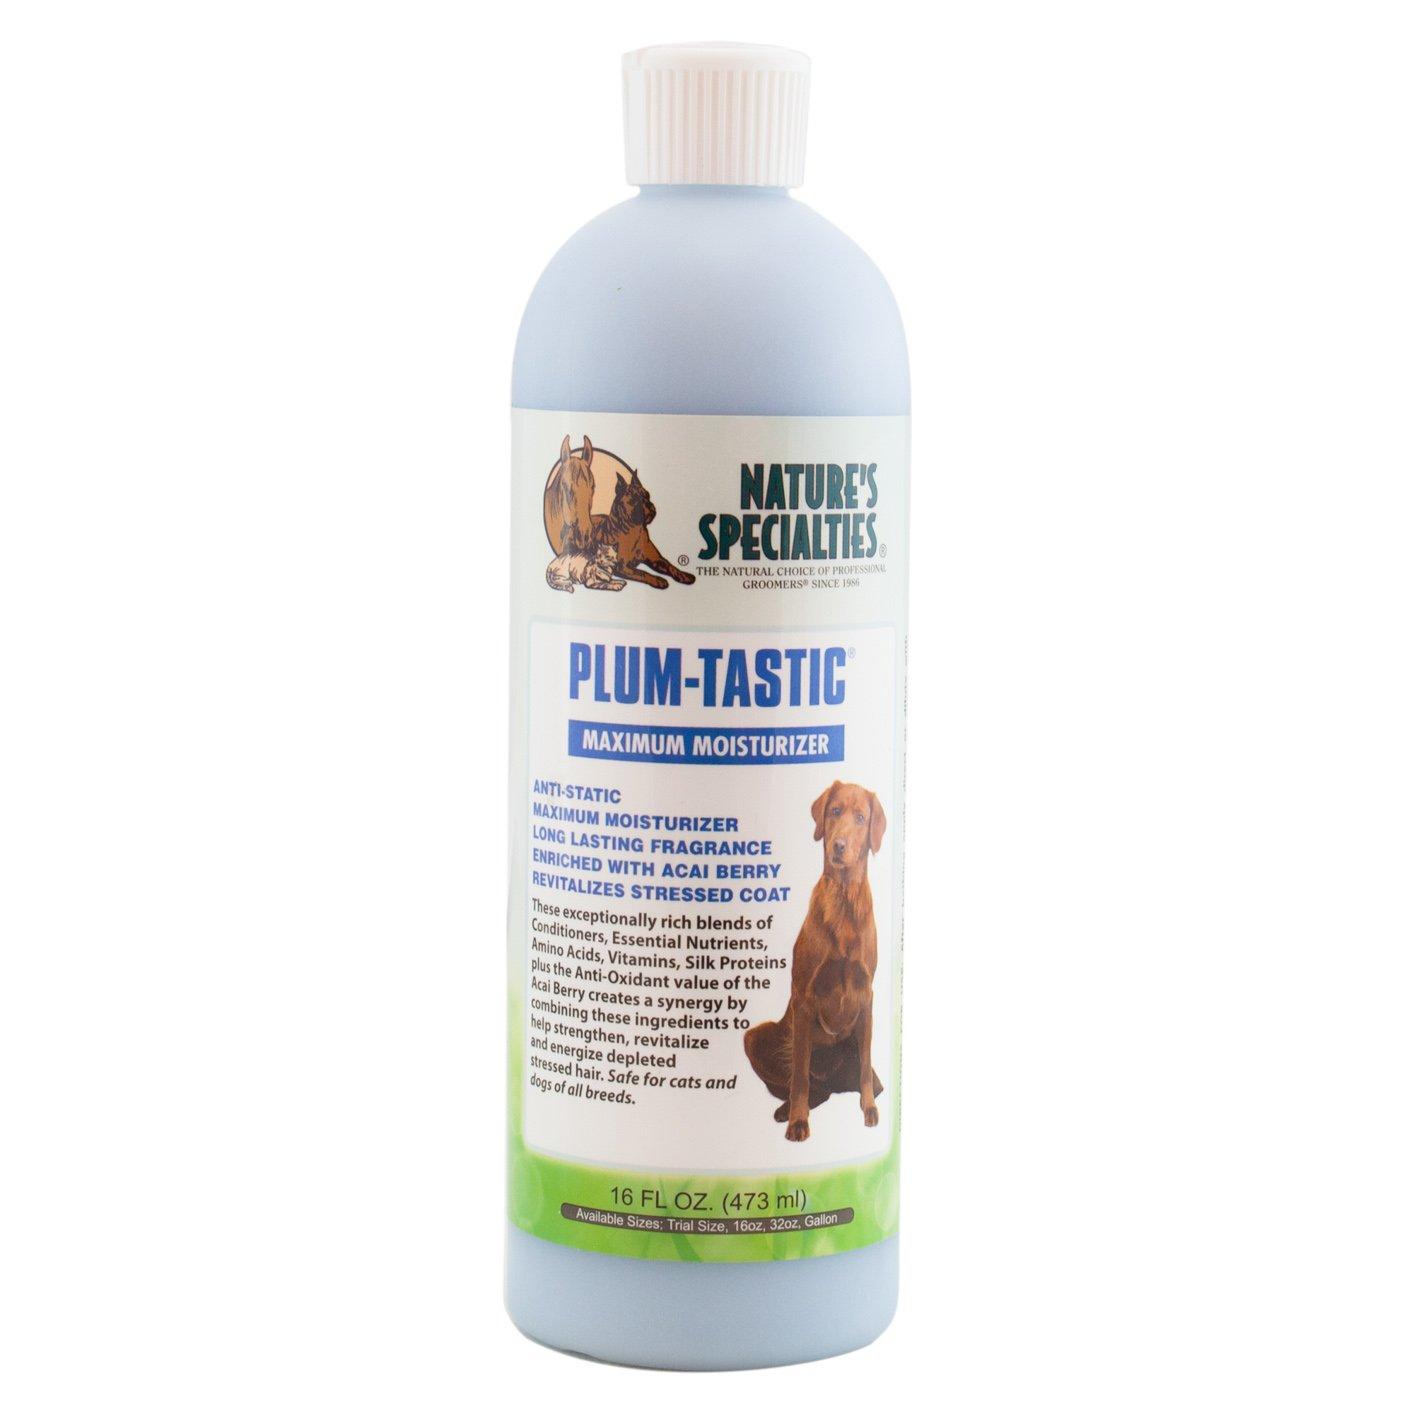 Nature's Specialties Plum-Tastic Maximum Moisturizer for Pets, 16-Ounce